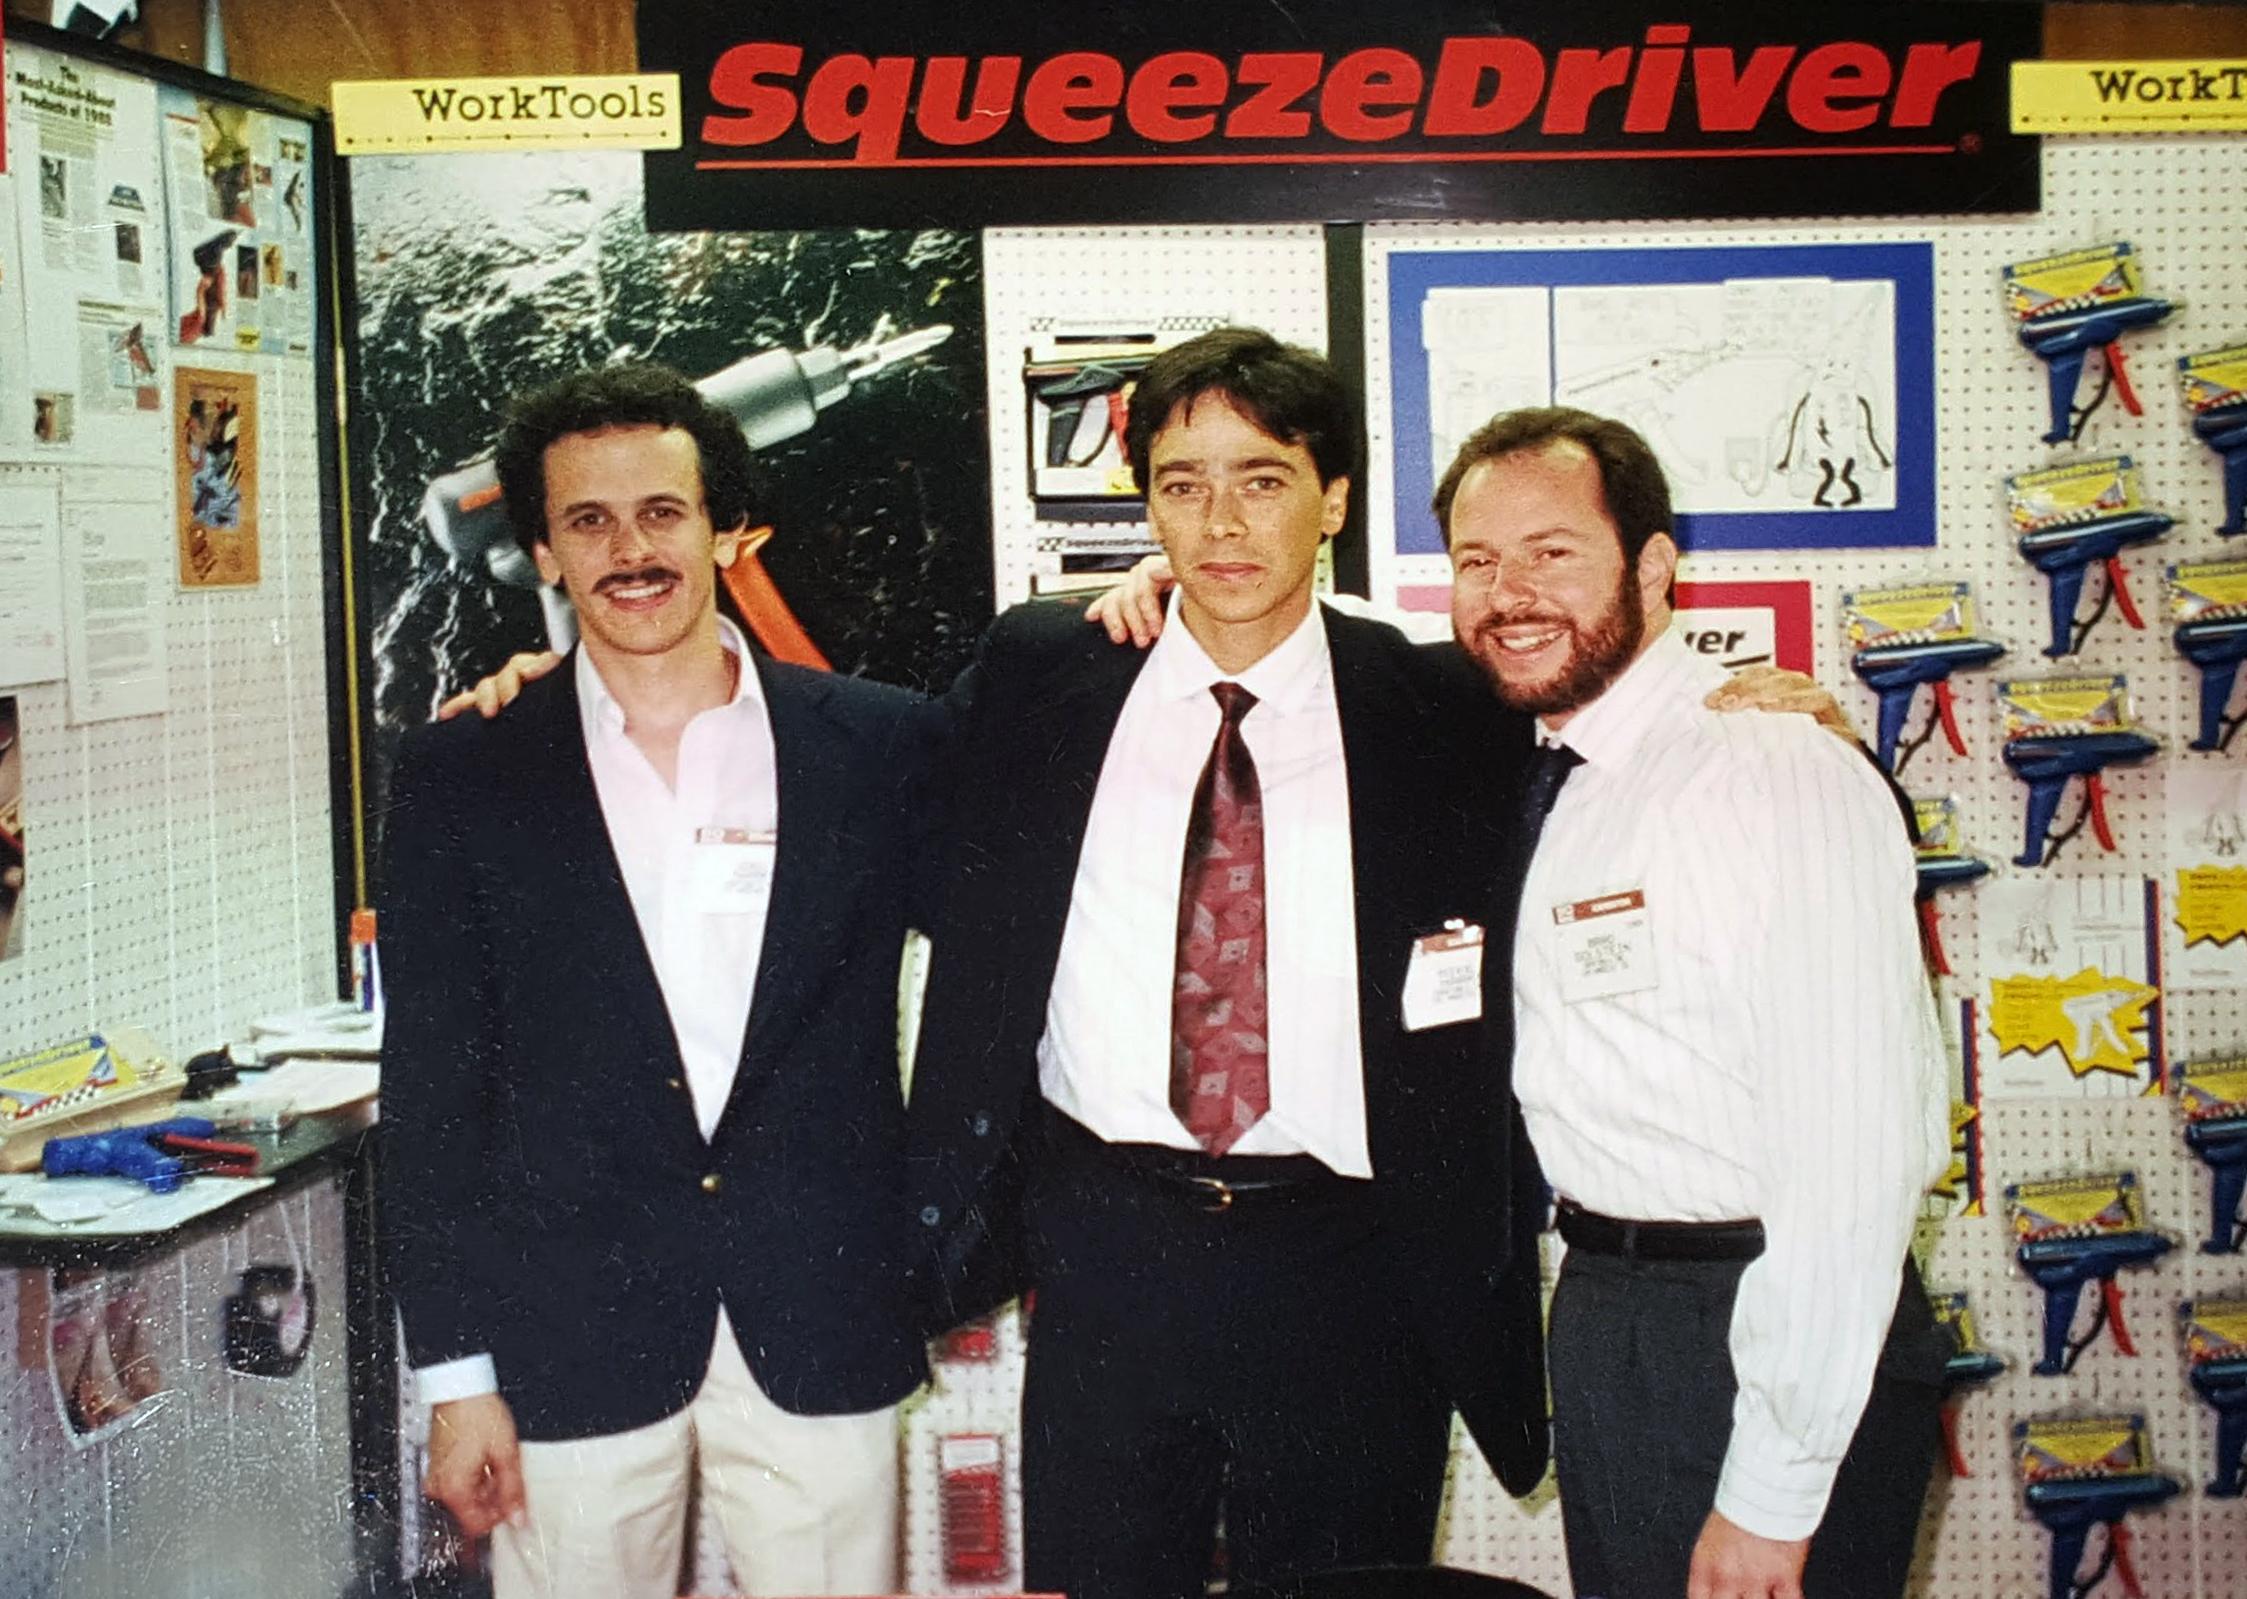 SqueezeDriver Team